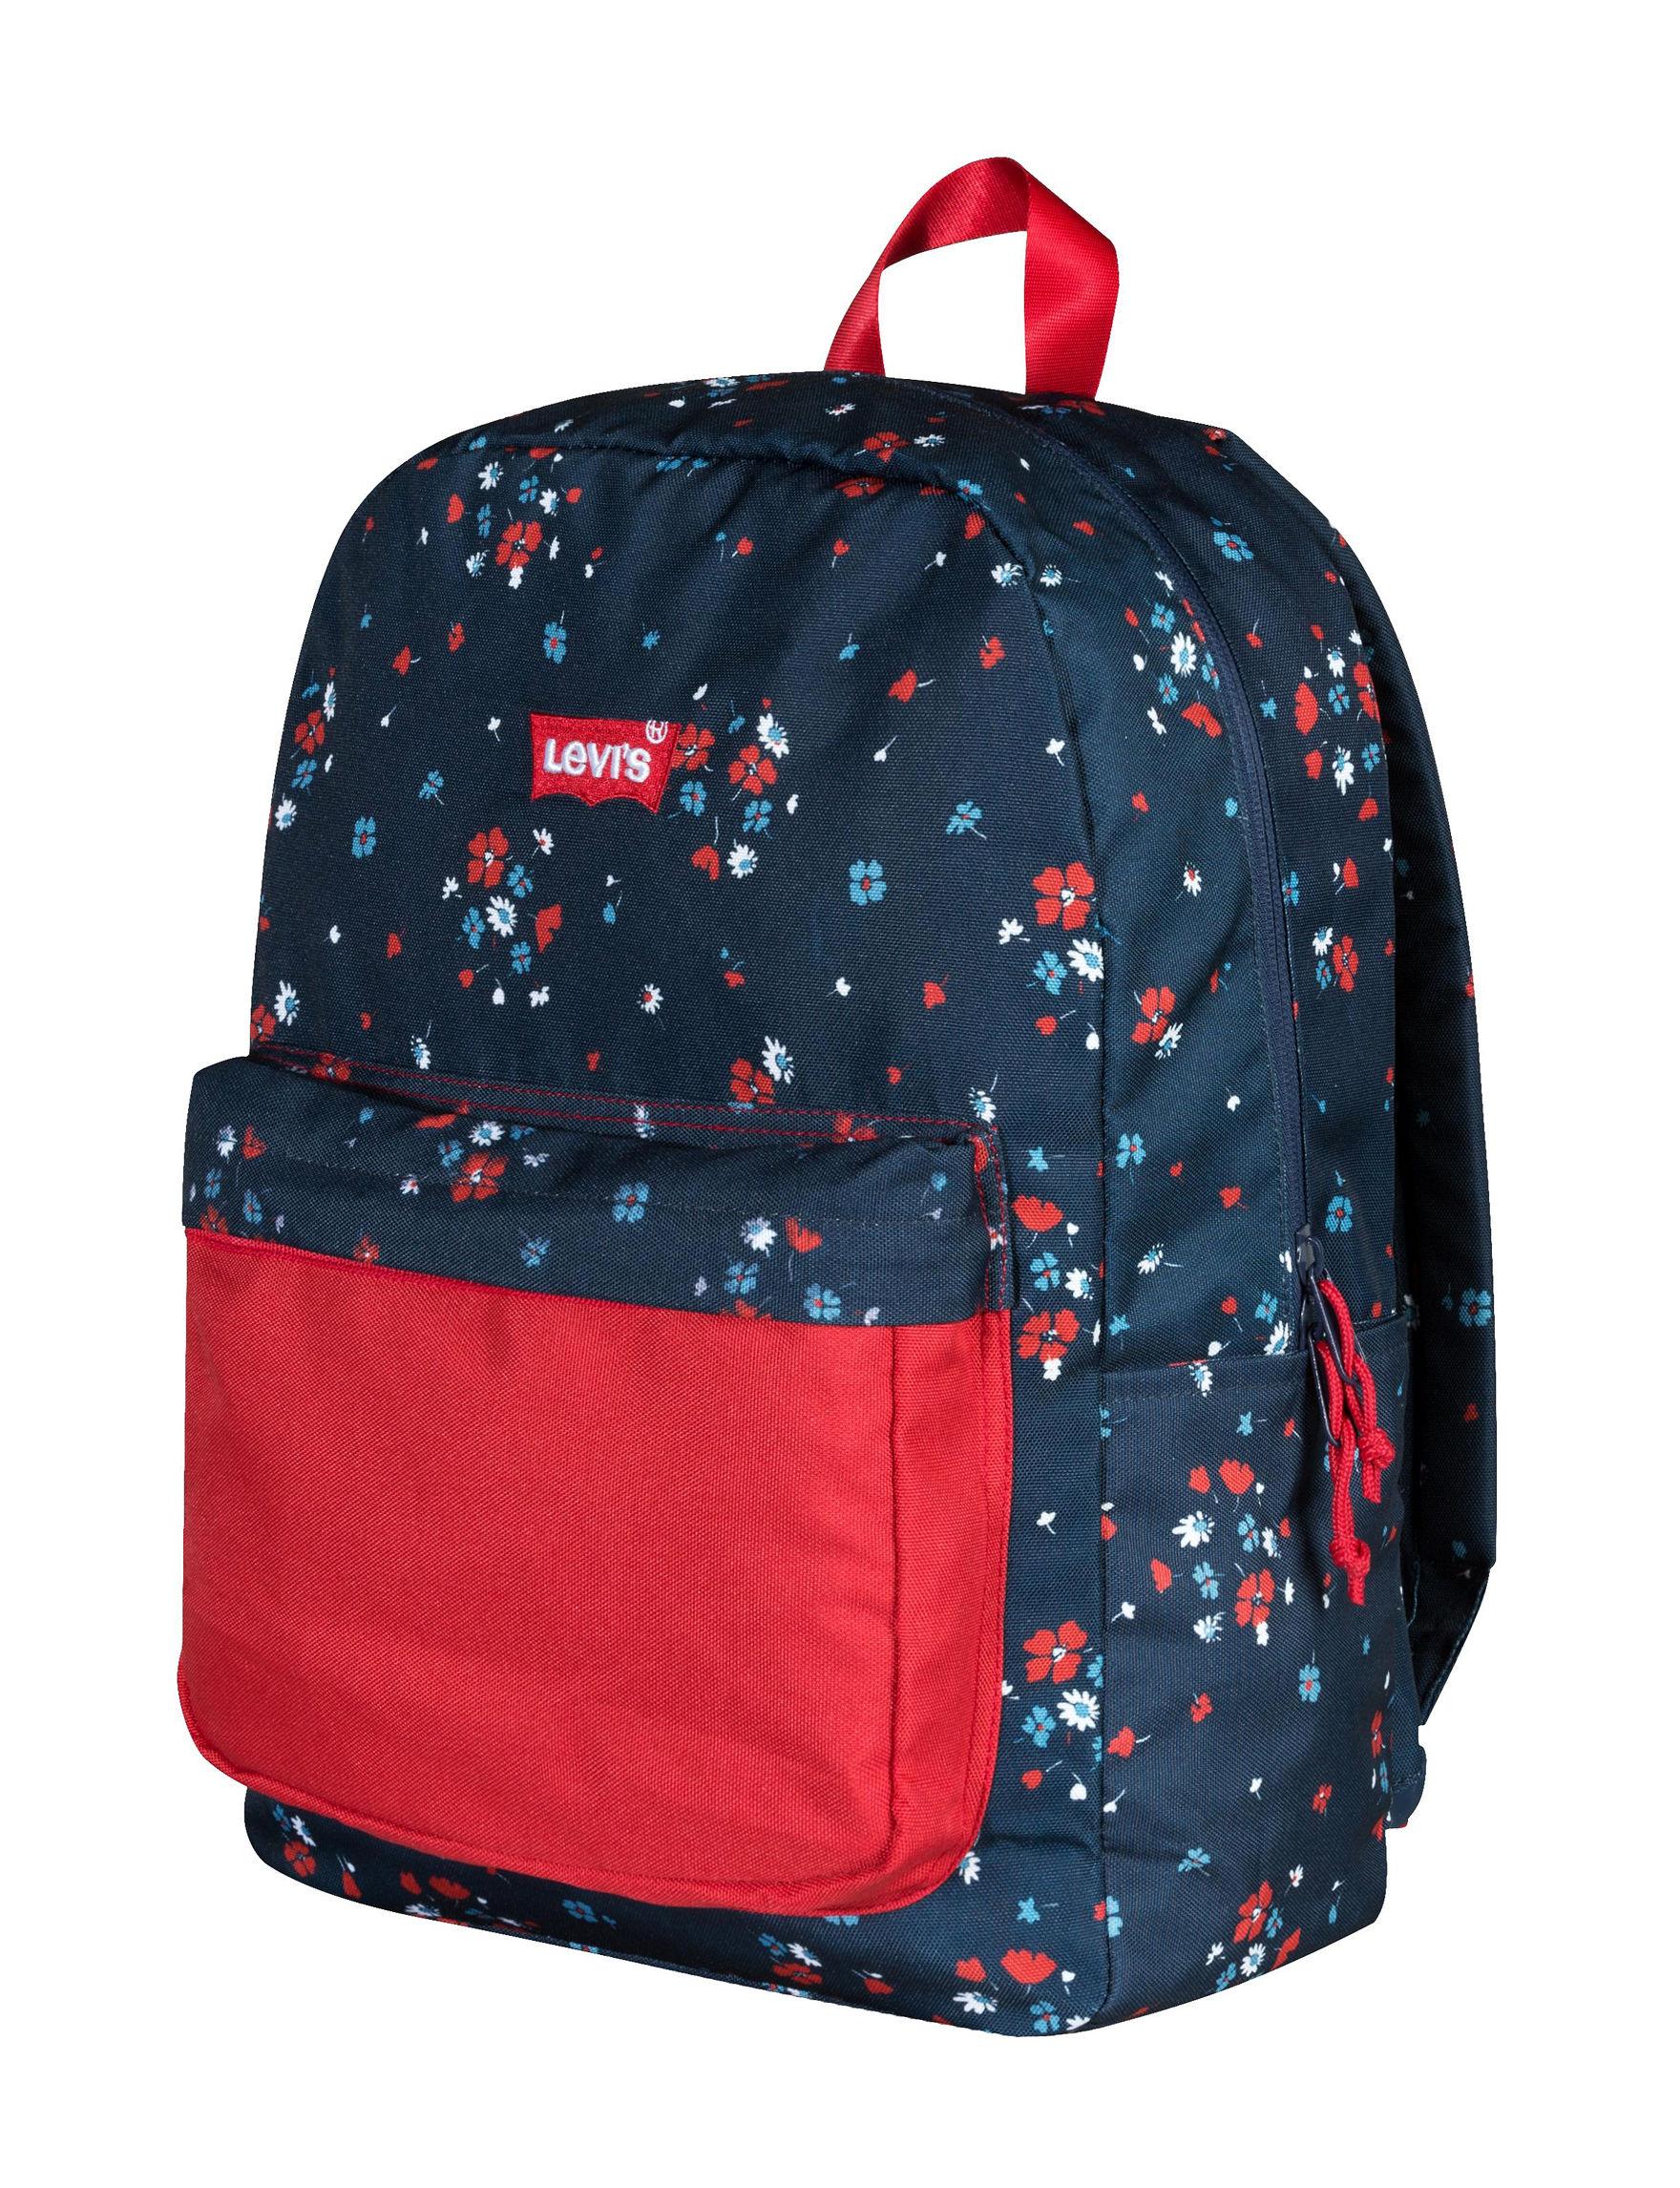 Levi's Floral Bookbags & Backpacks